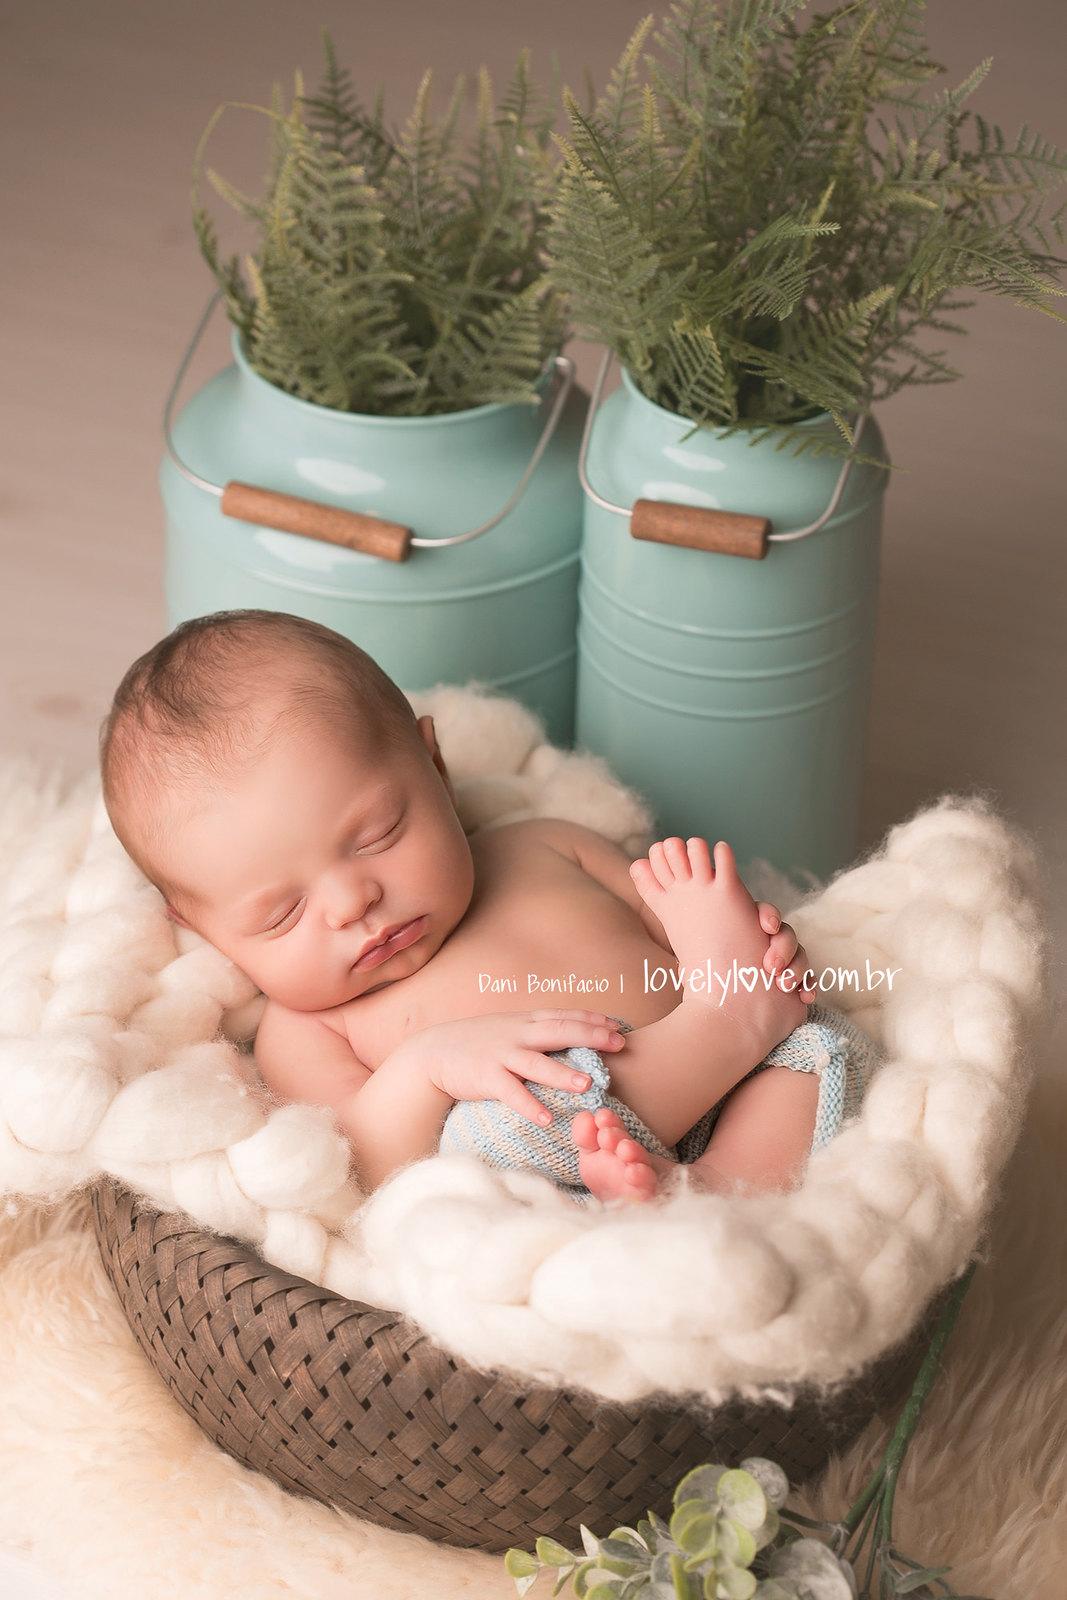 danibonifacio-lovelylove-ensaio-book-newborn-recem-nascido-bebe-nenem-infantil-criança-gestante-gravida-fotografa-fotografia-foto-balneario-camboriu-itajai-portobelo-bombinhas-blumenau-florianopolis-saojose8